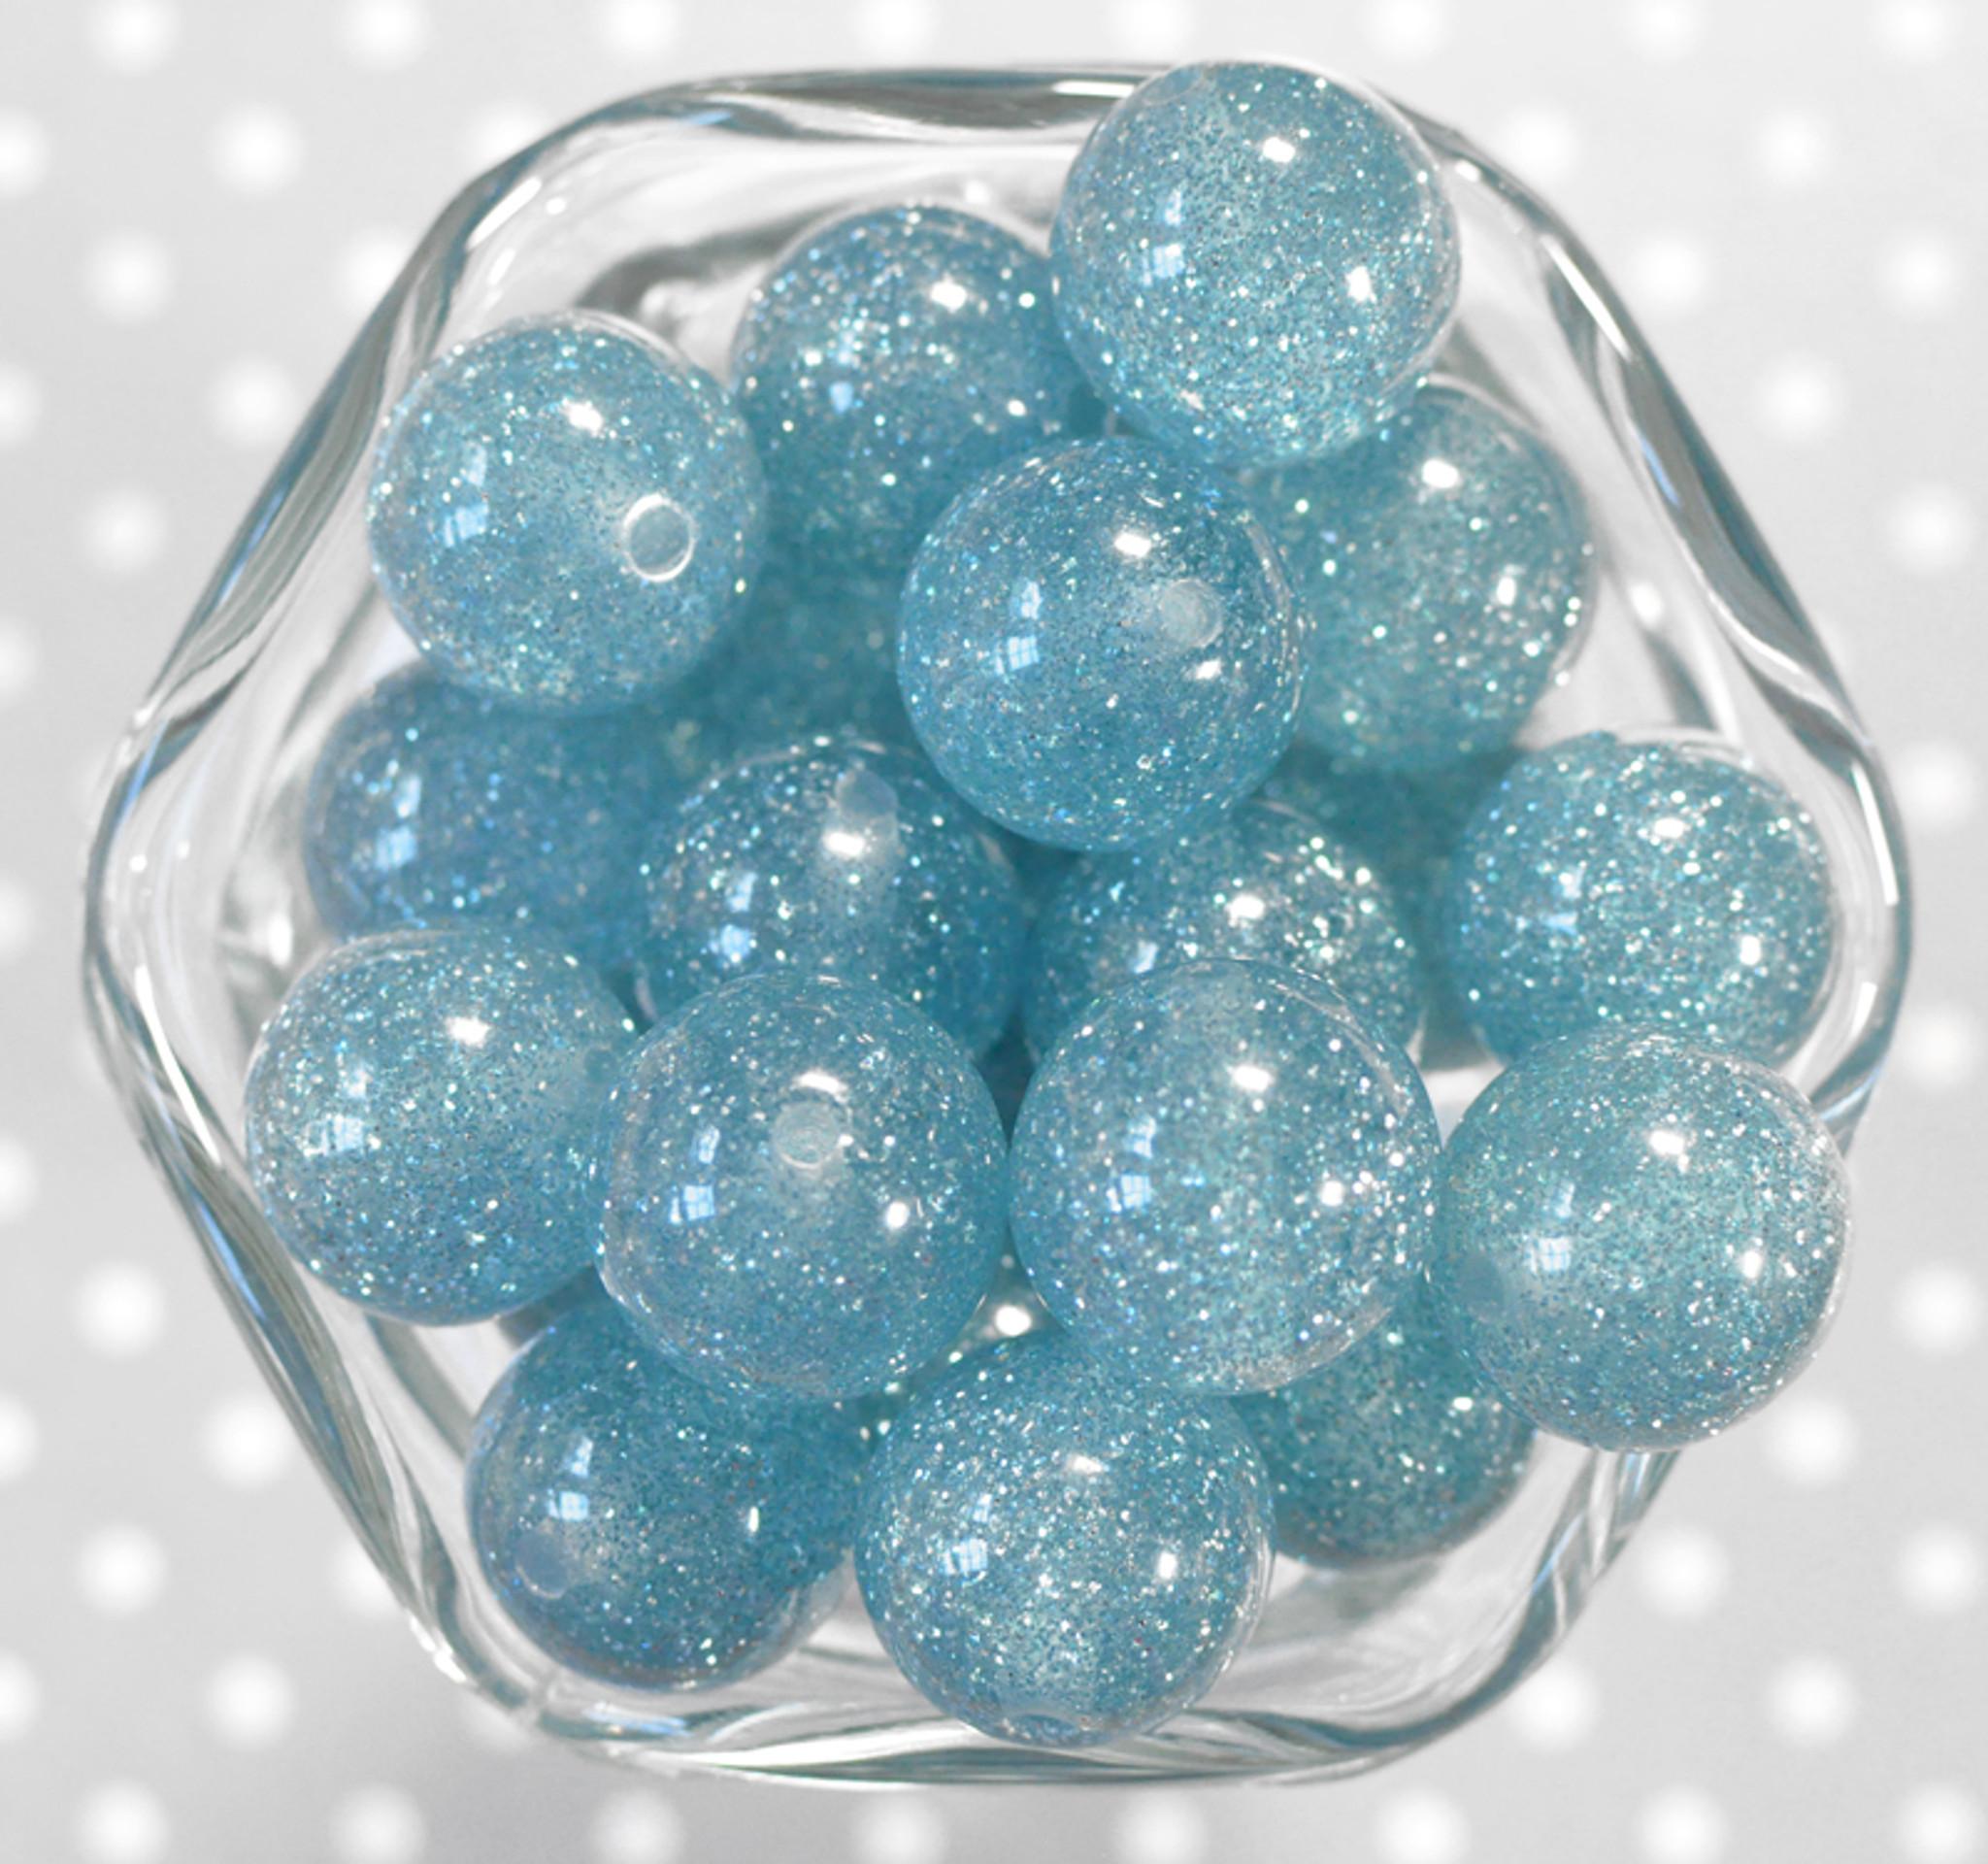 20mm Denim blue glitter jelly bubblegum beads